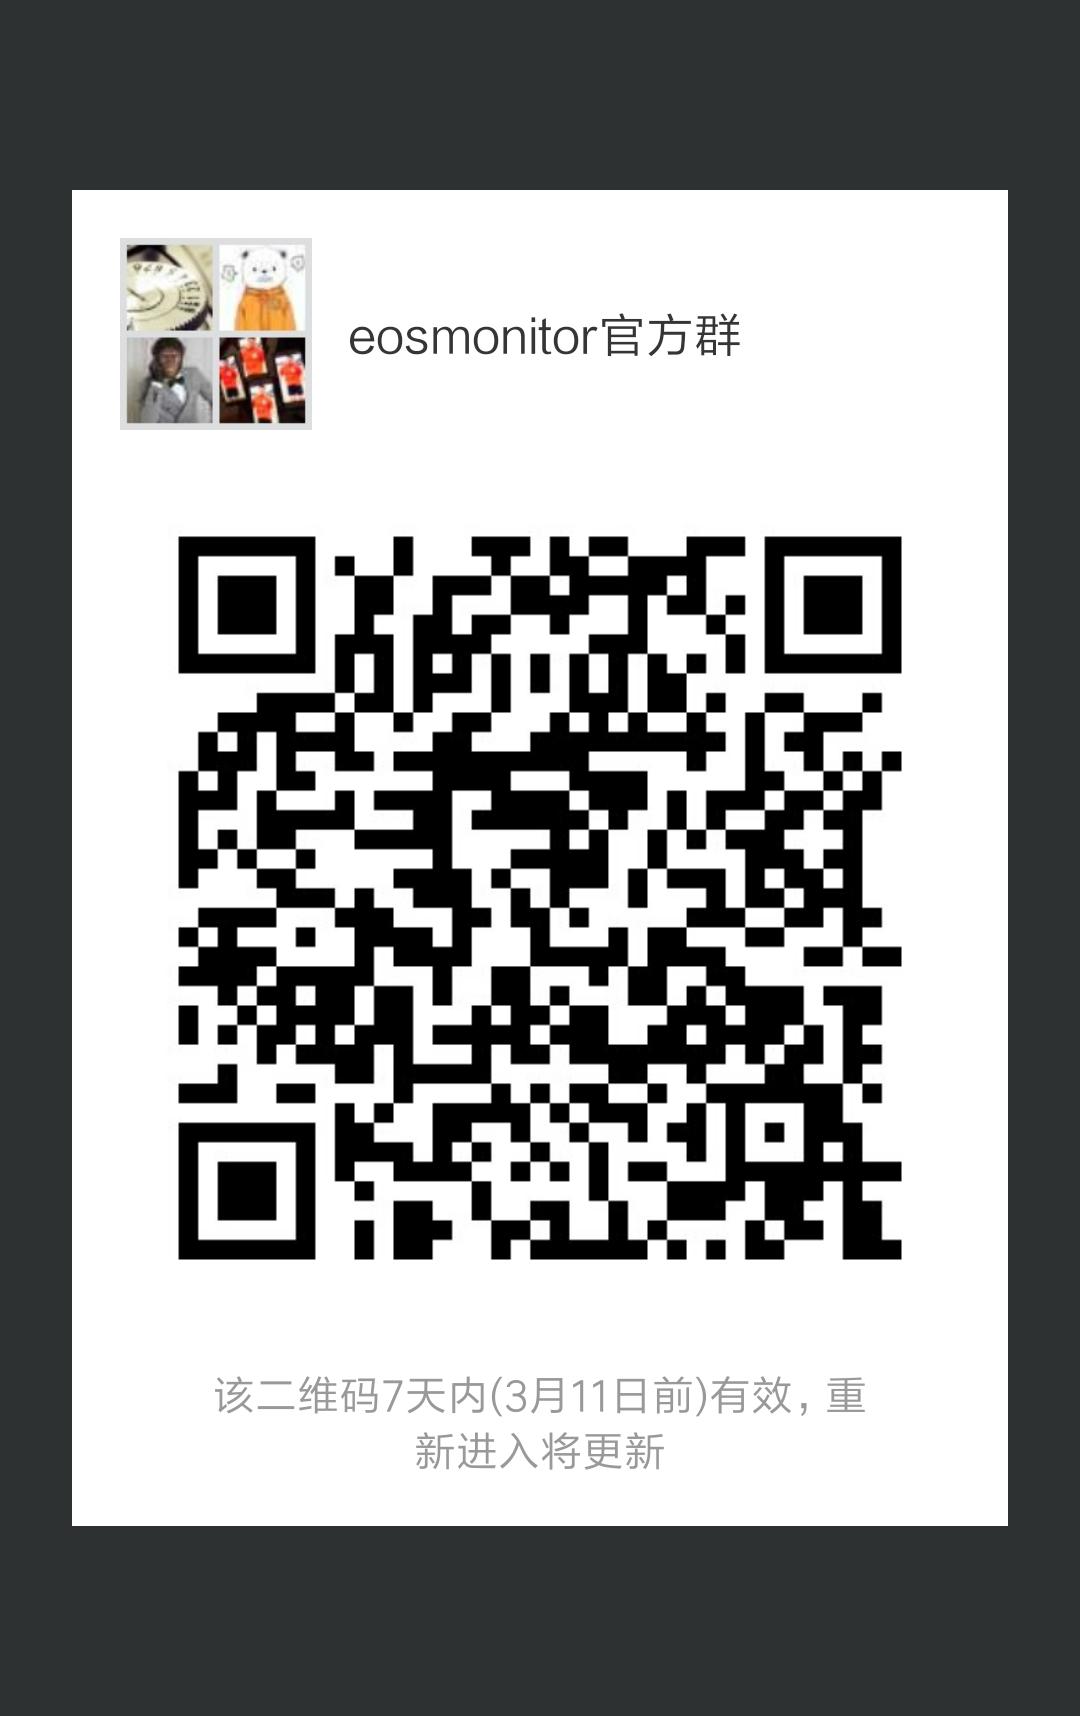 eosmonitor 微信群